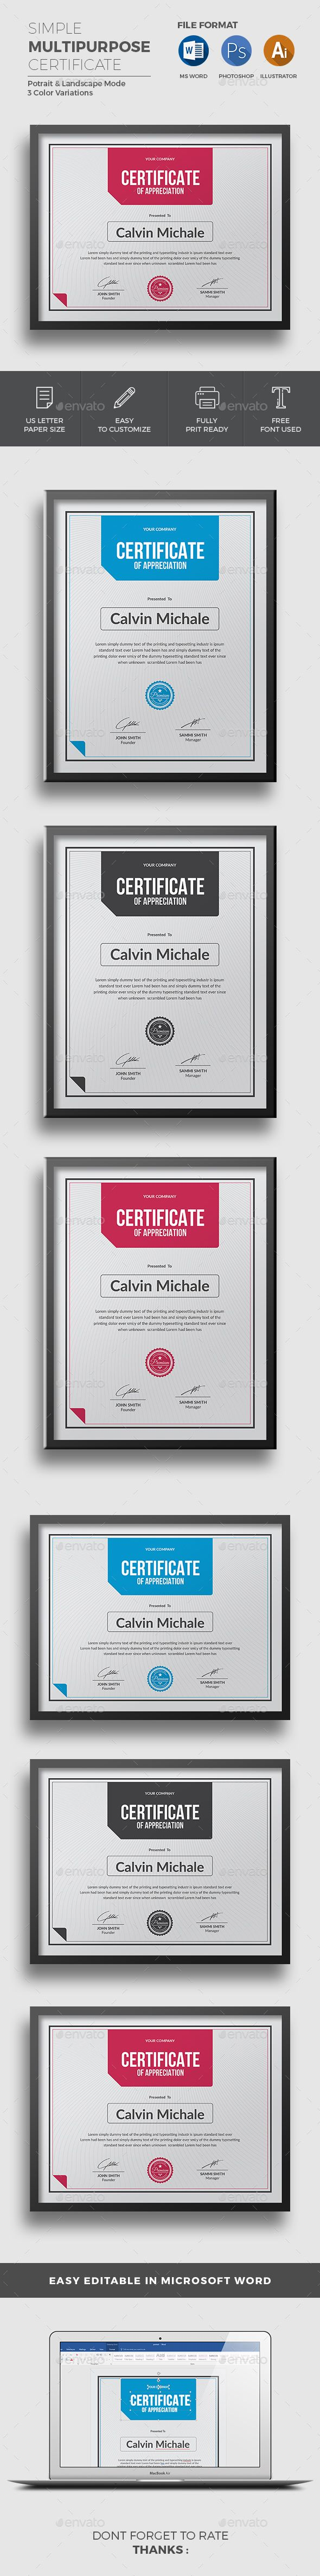 Modern MS Word certificate template Stationery templates - mandegar.info